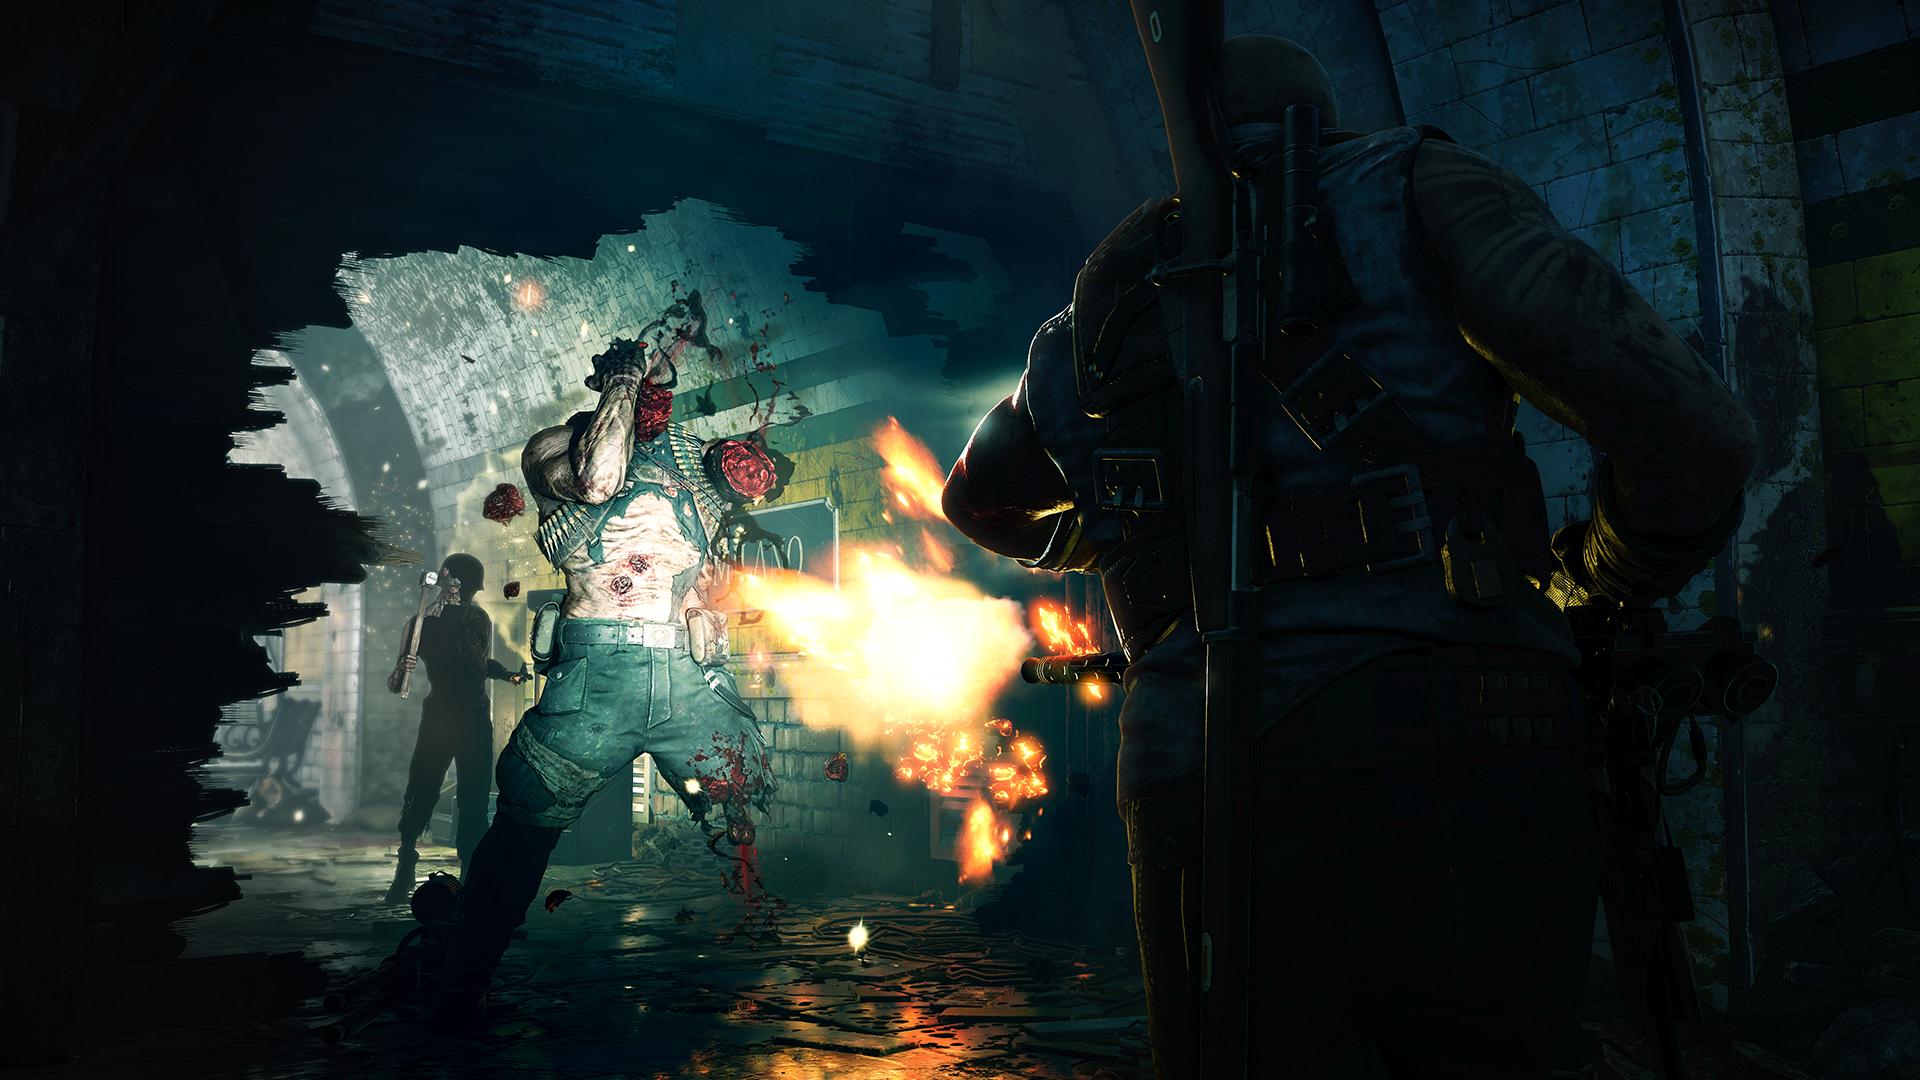 Скриншот 0 - Zombie Army 4: Dead War  [АКТИВАЦИЯ] [Epic Games]